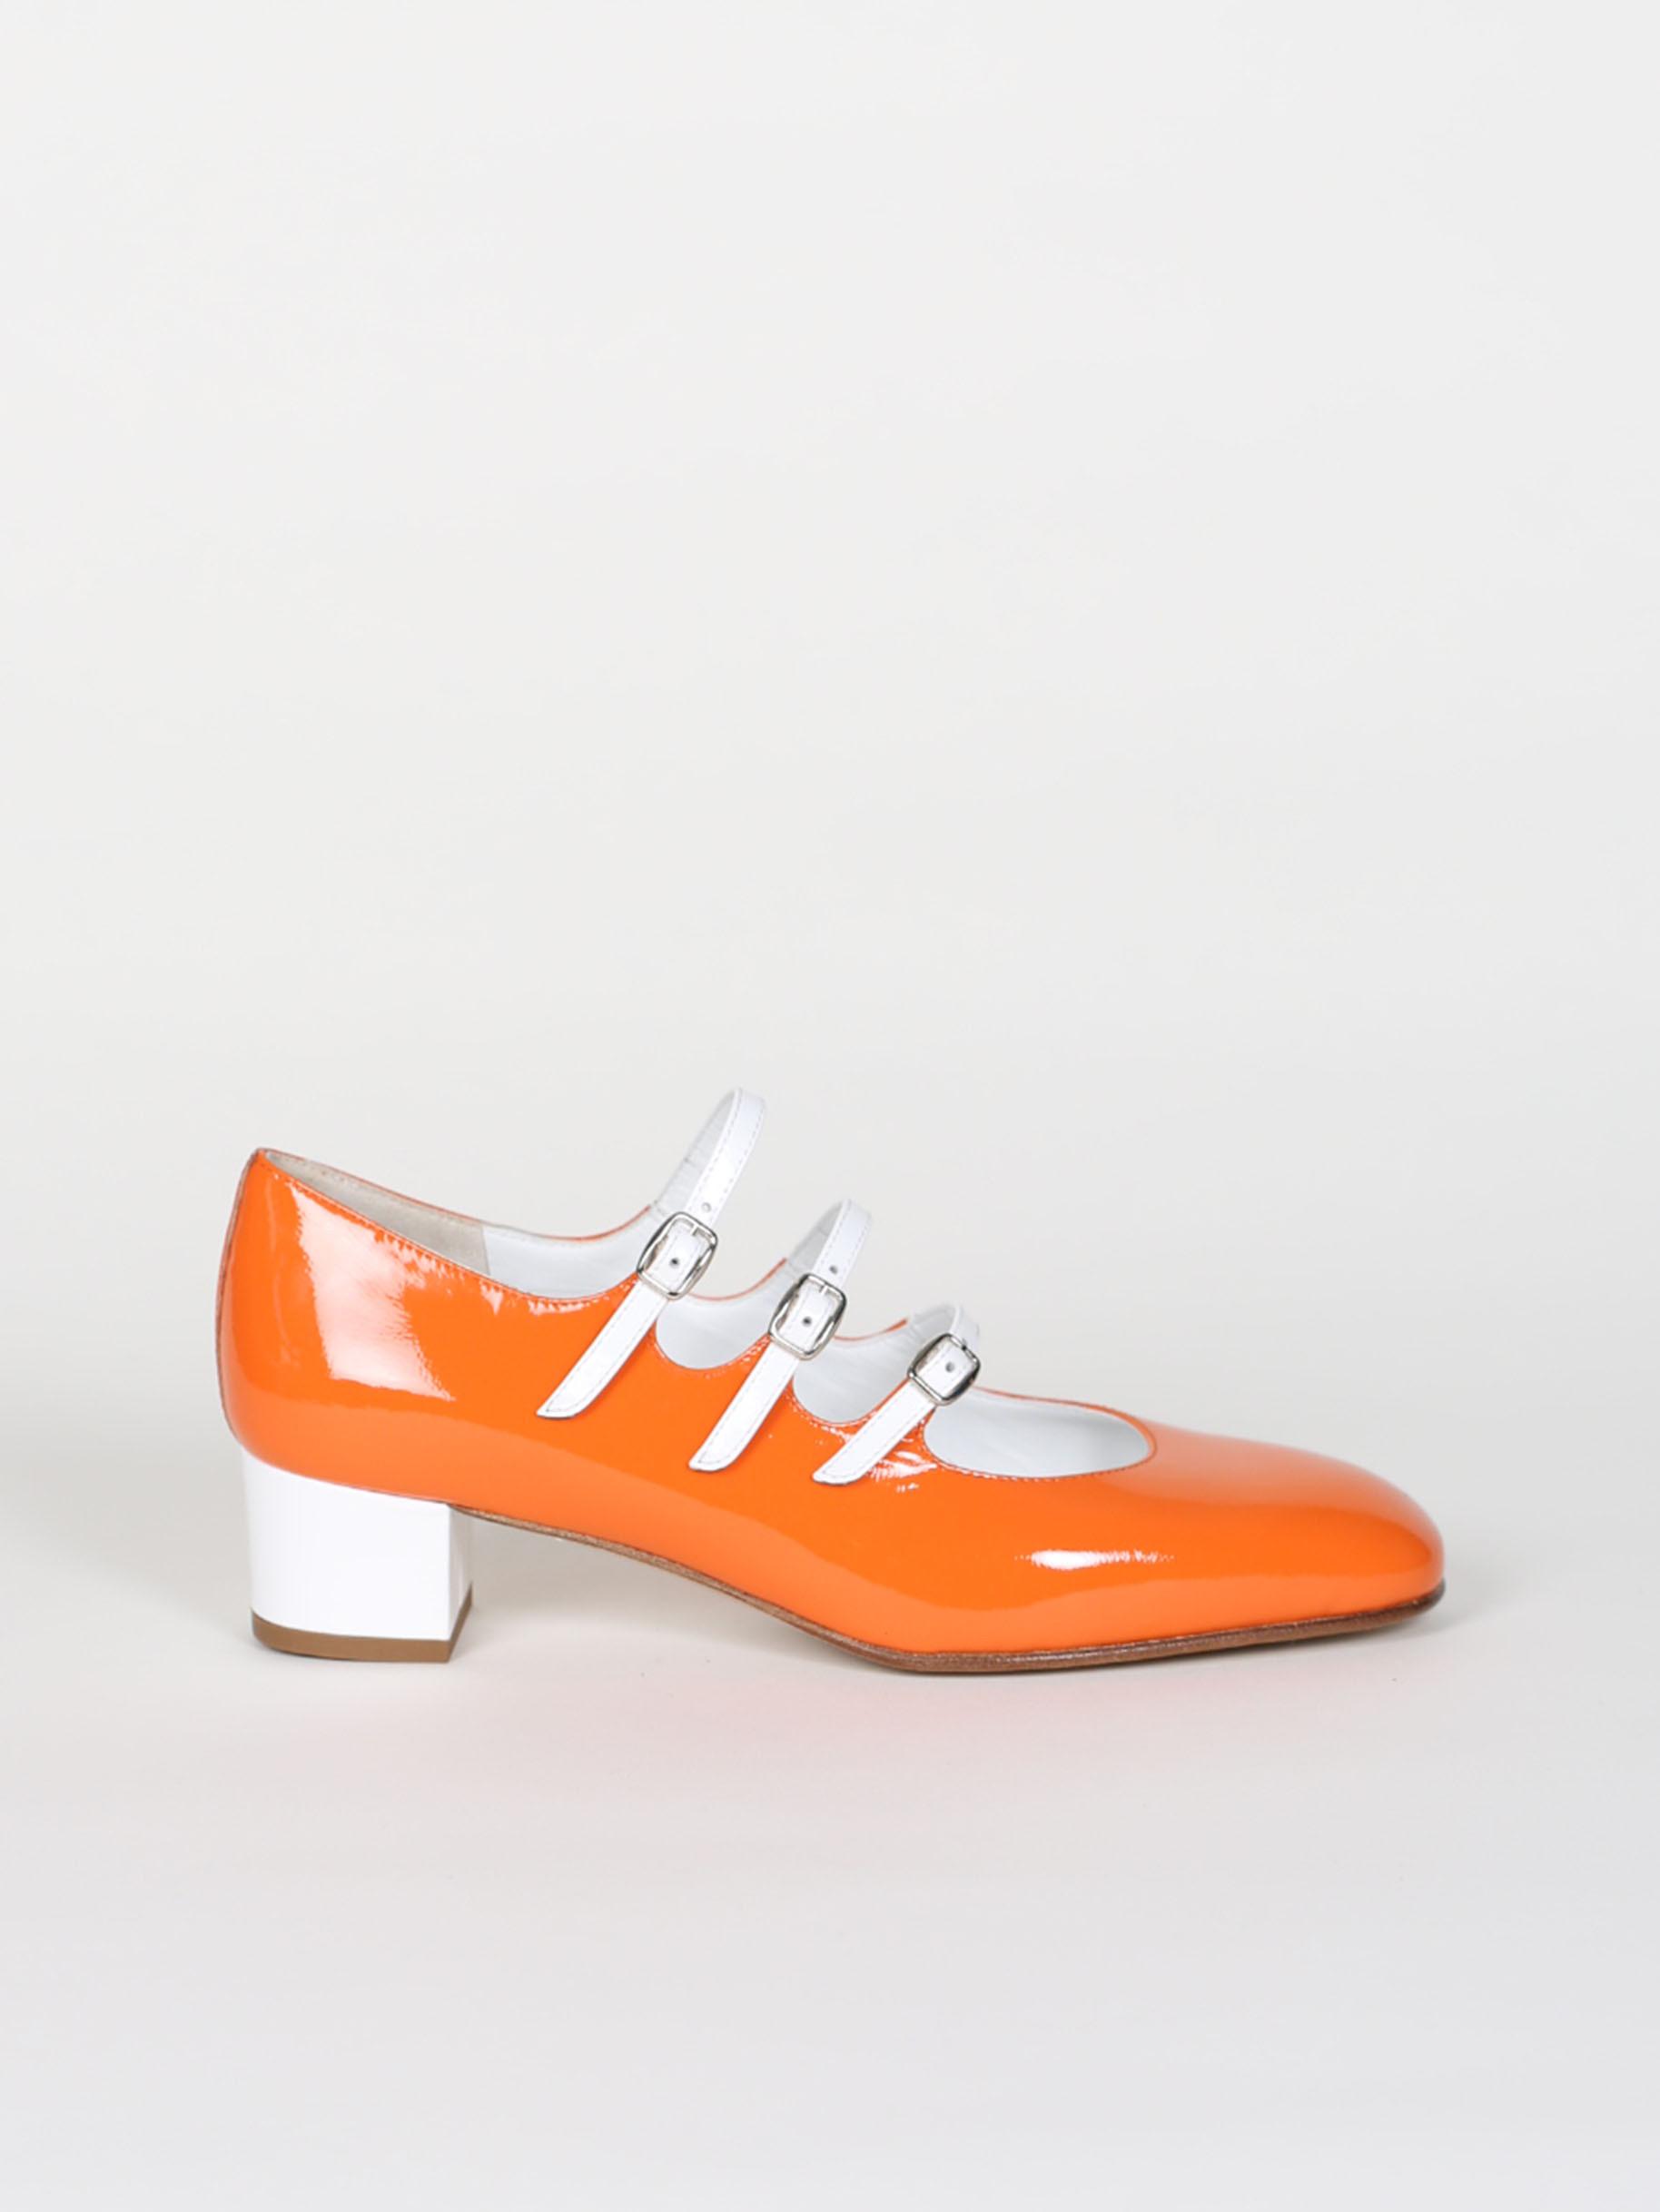 Orange and white patent leather Mary Jane